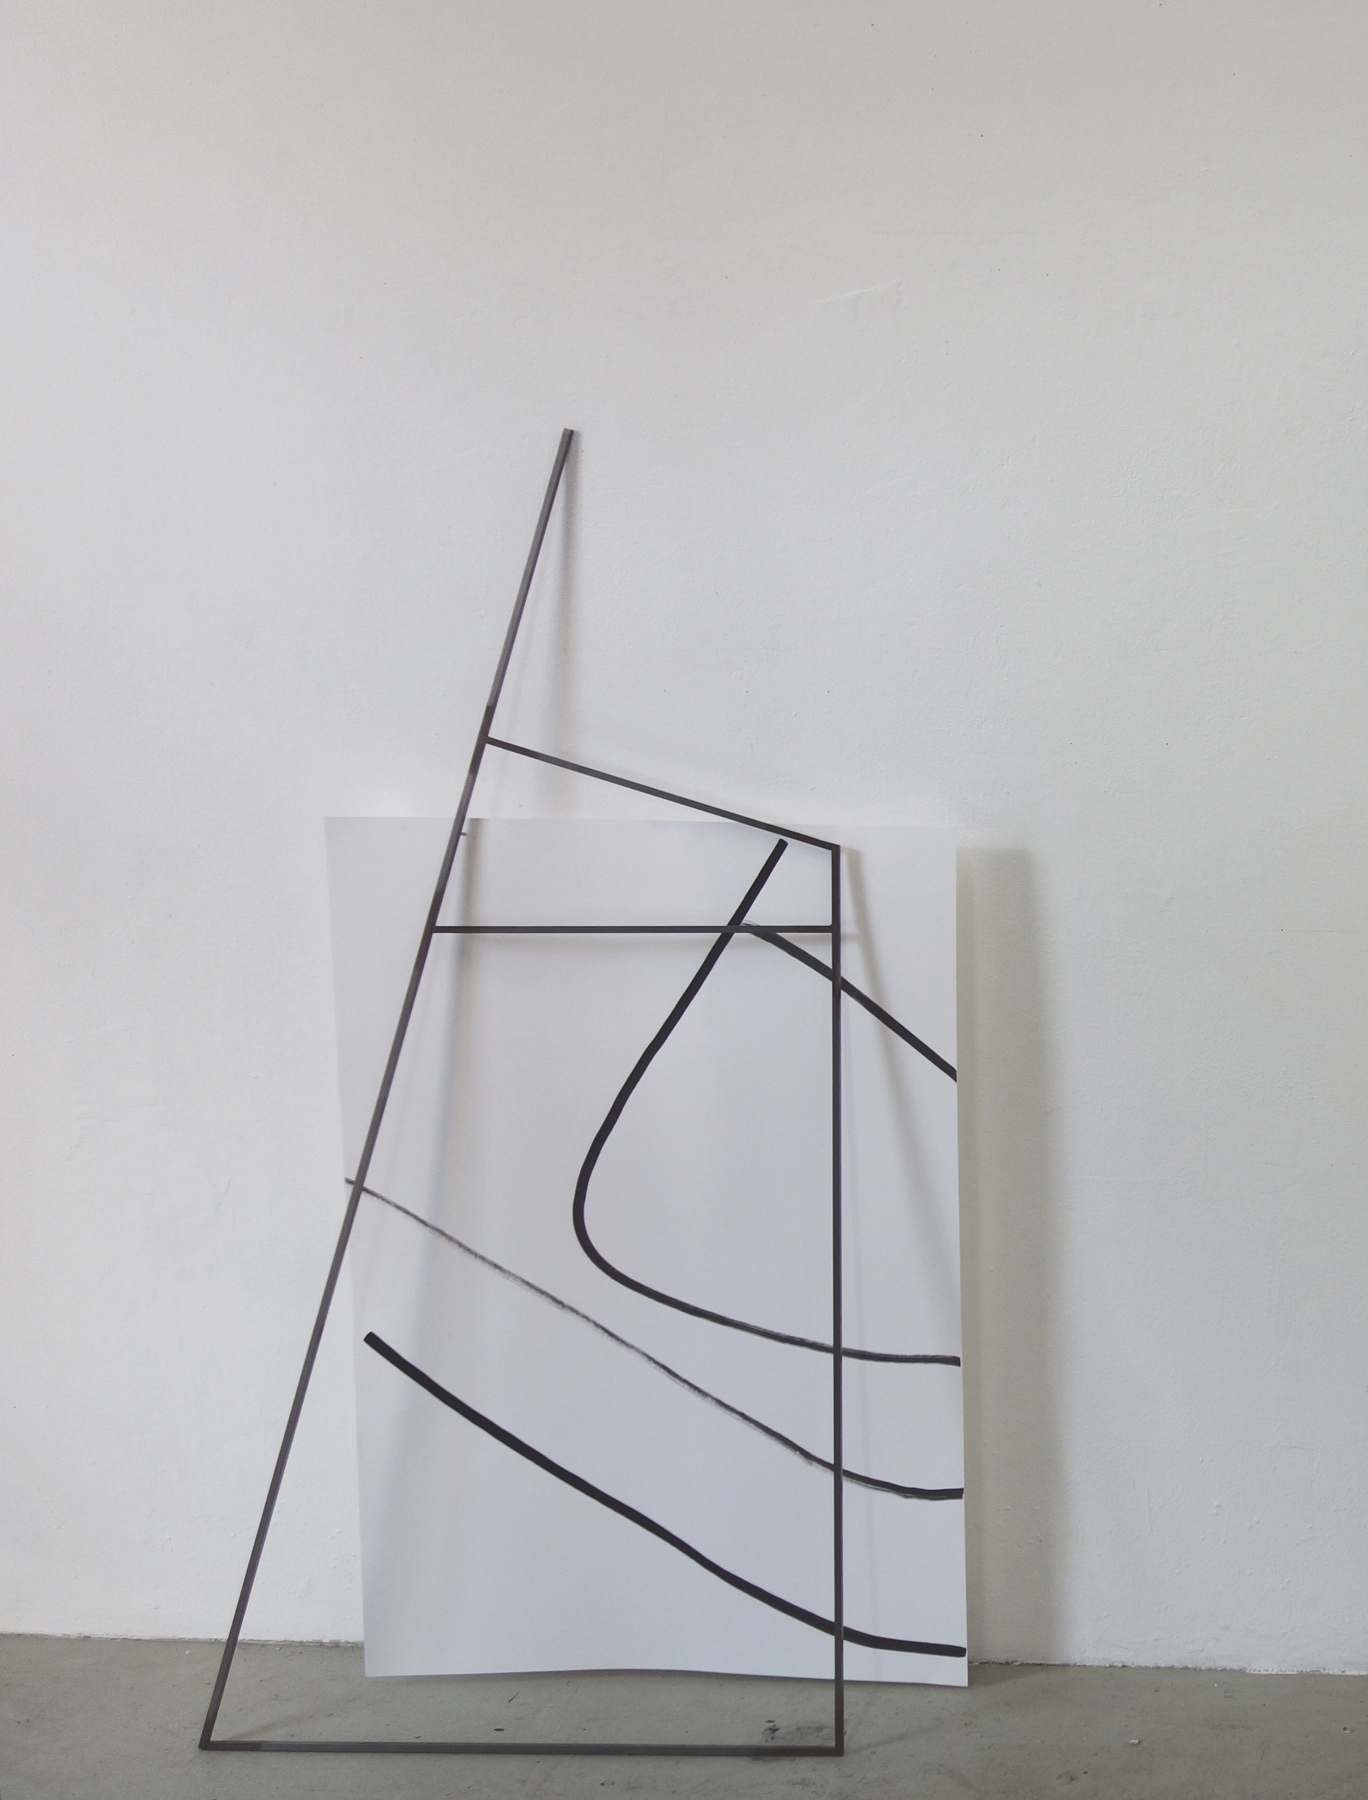 Nina Annabelle Märkl | Frames | Ink and steel drawing | 150 x 80 x 5 cm | 2018